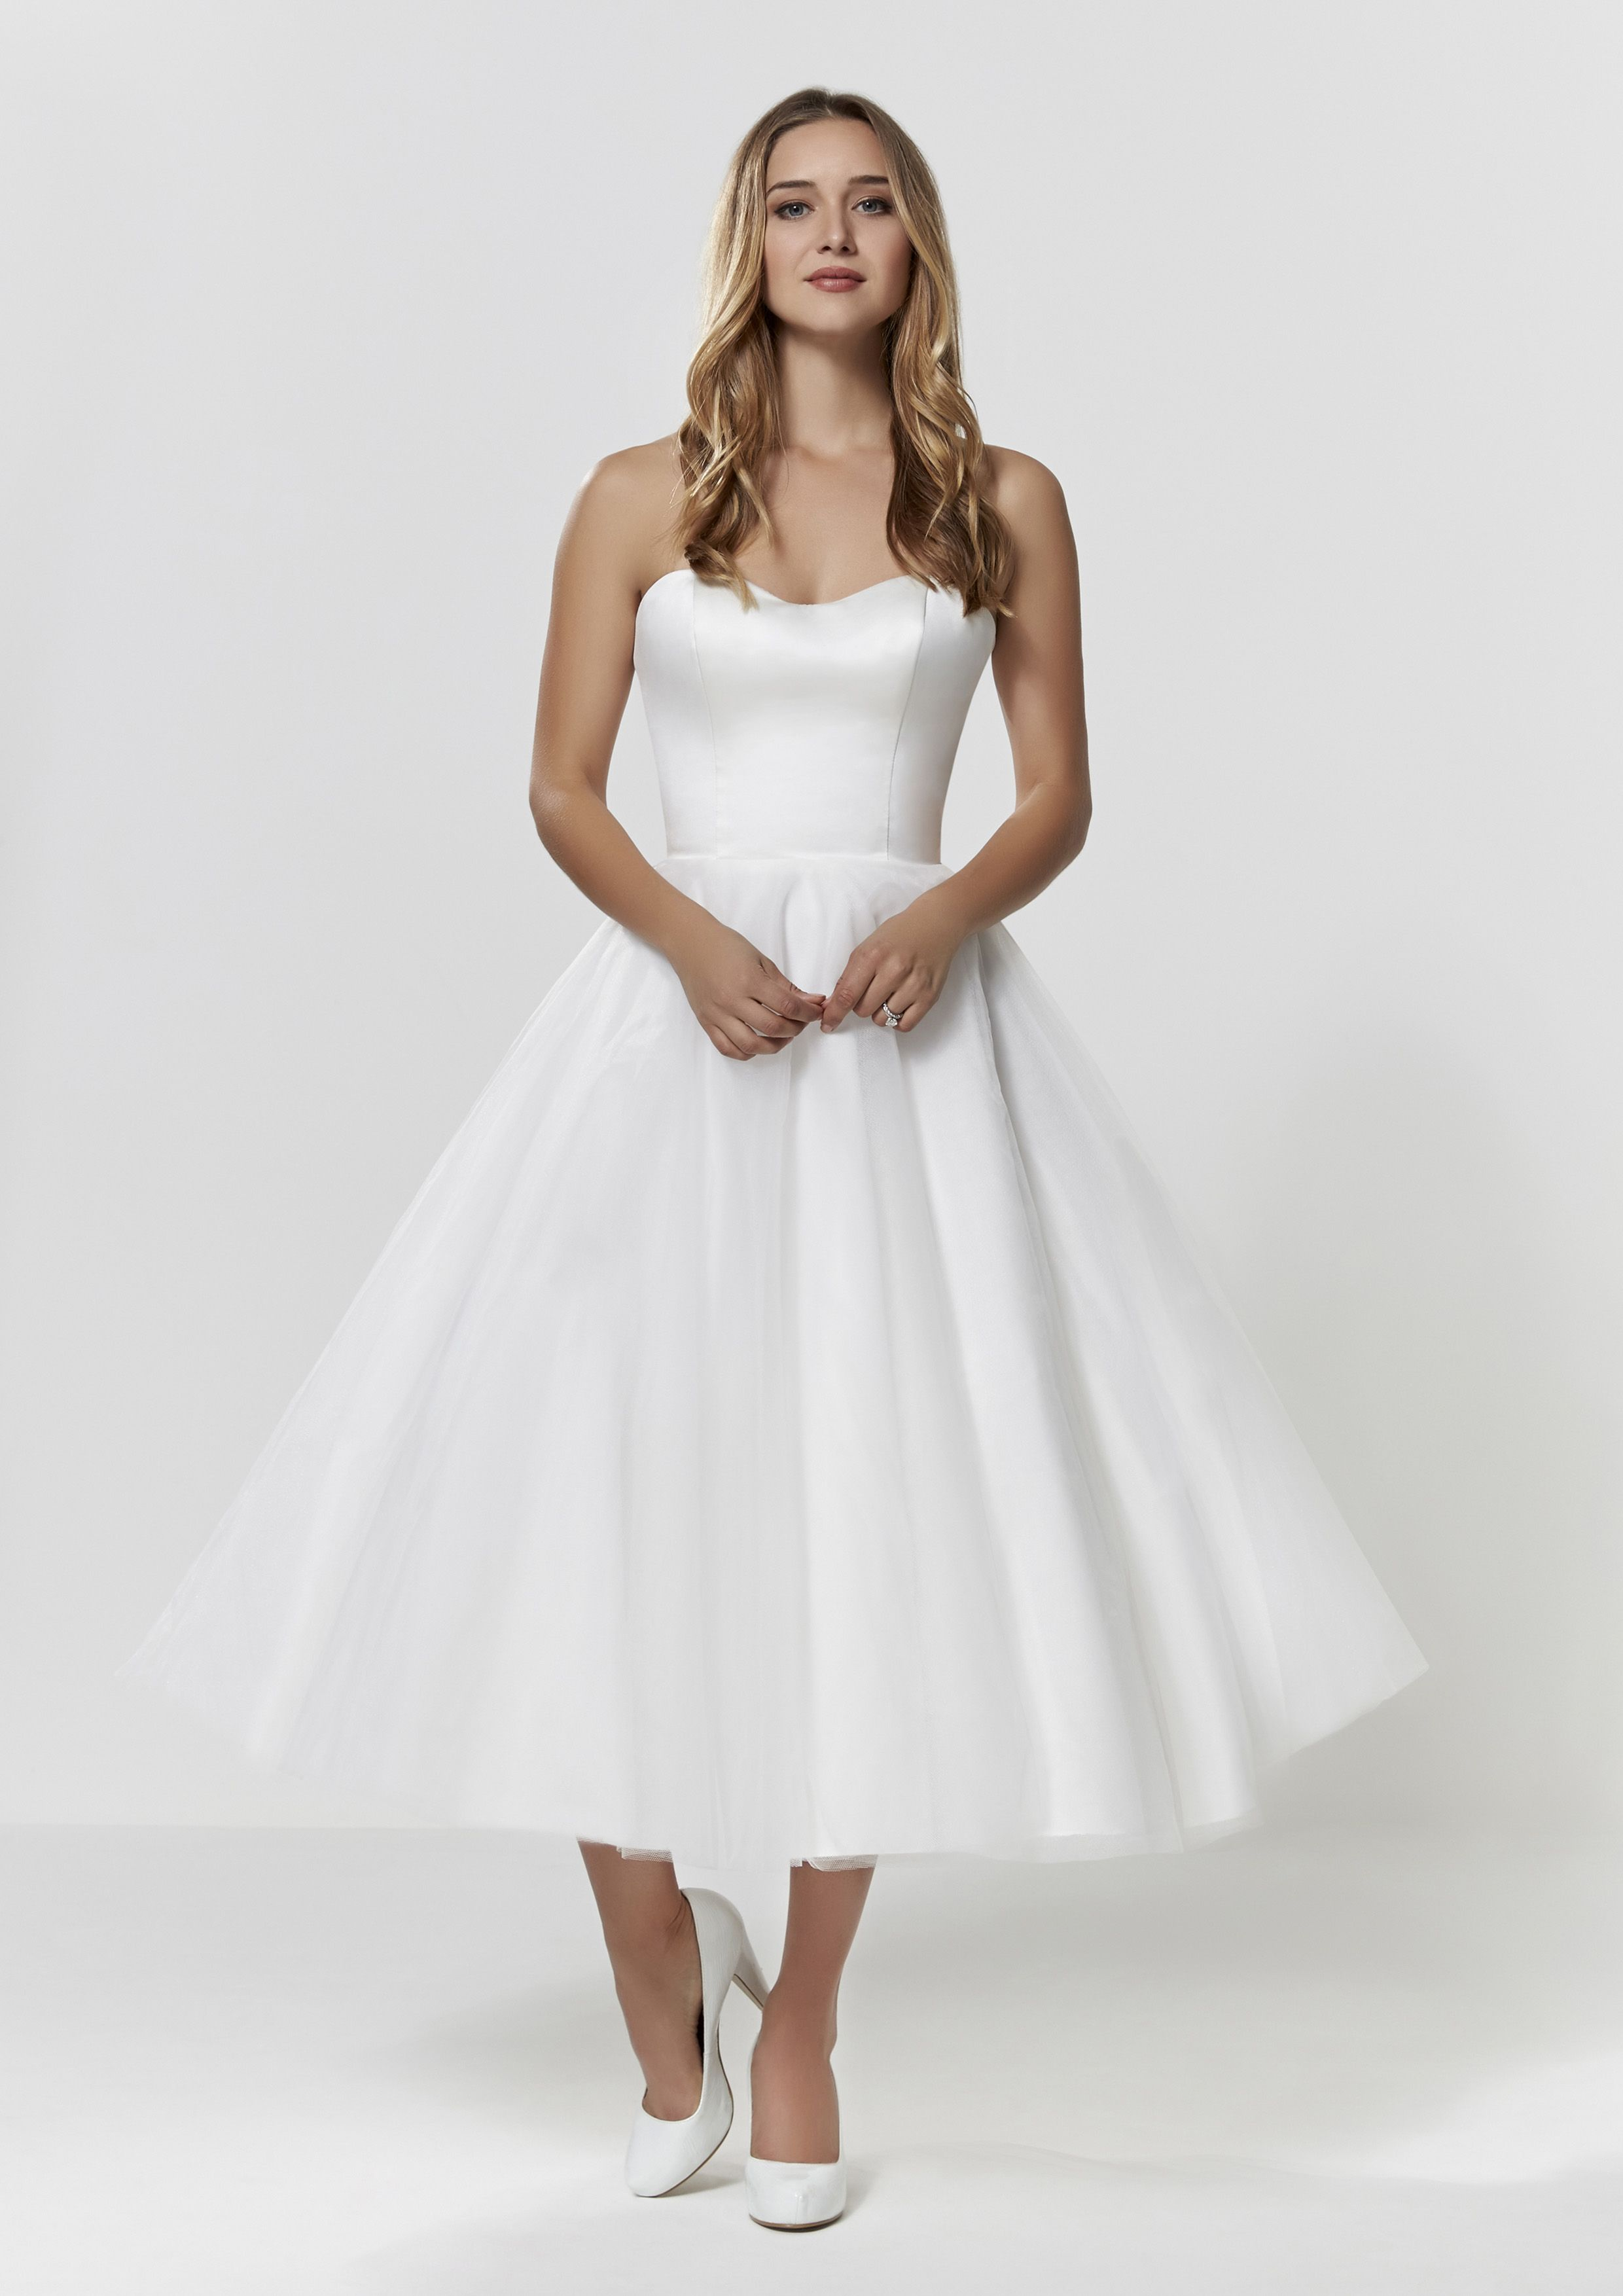 short tulle wedding dress Short Tulle Wedding Dress Check out our Custom Pin Options CustomWeddingDress